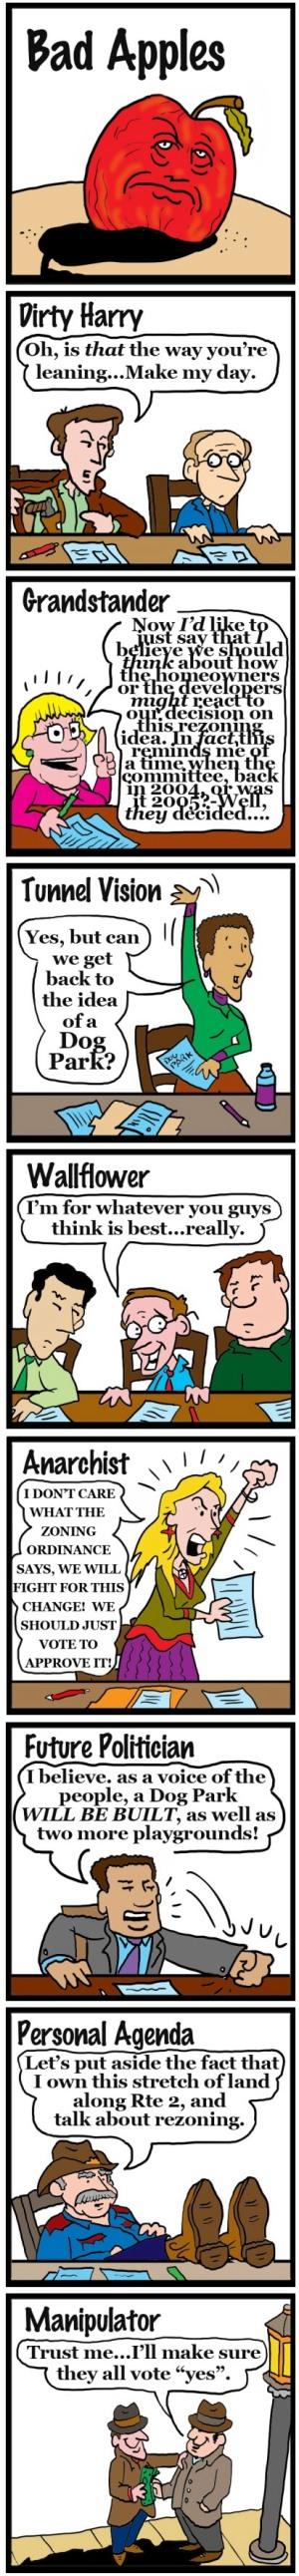 Bad Apples comic strip by Marc Hughes.